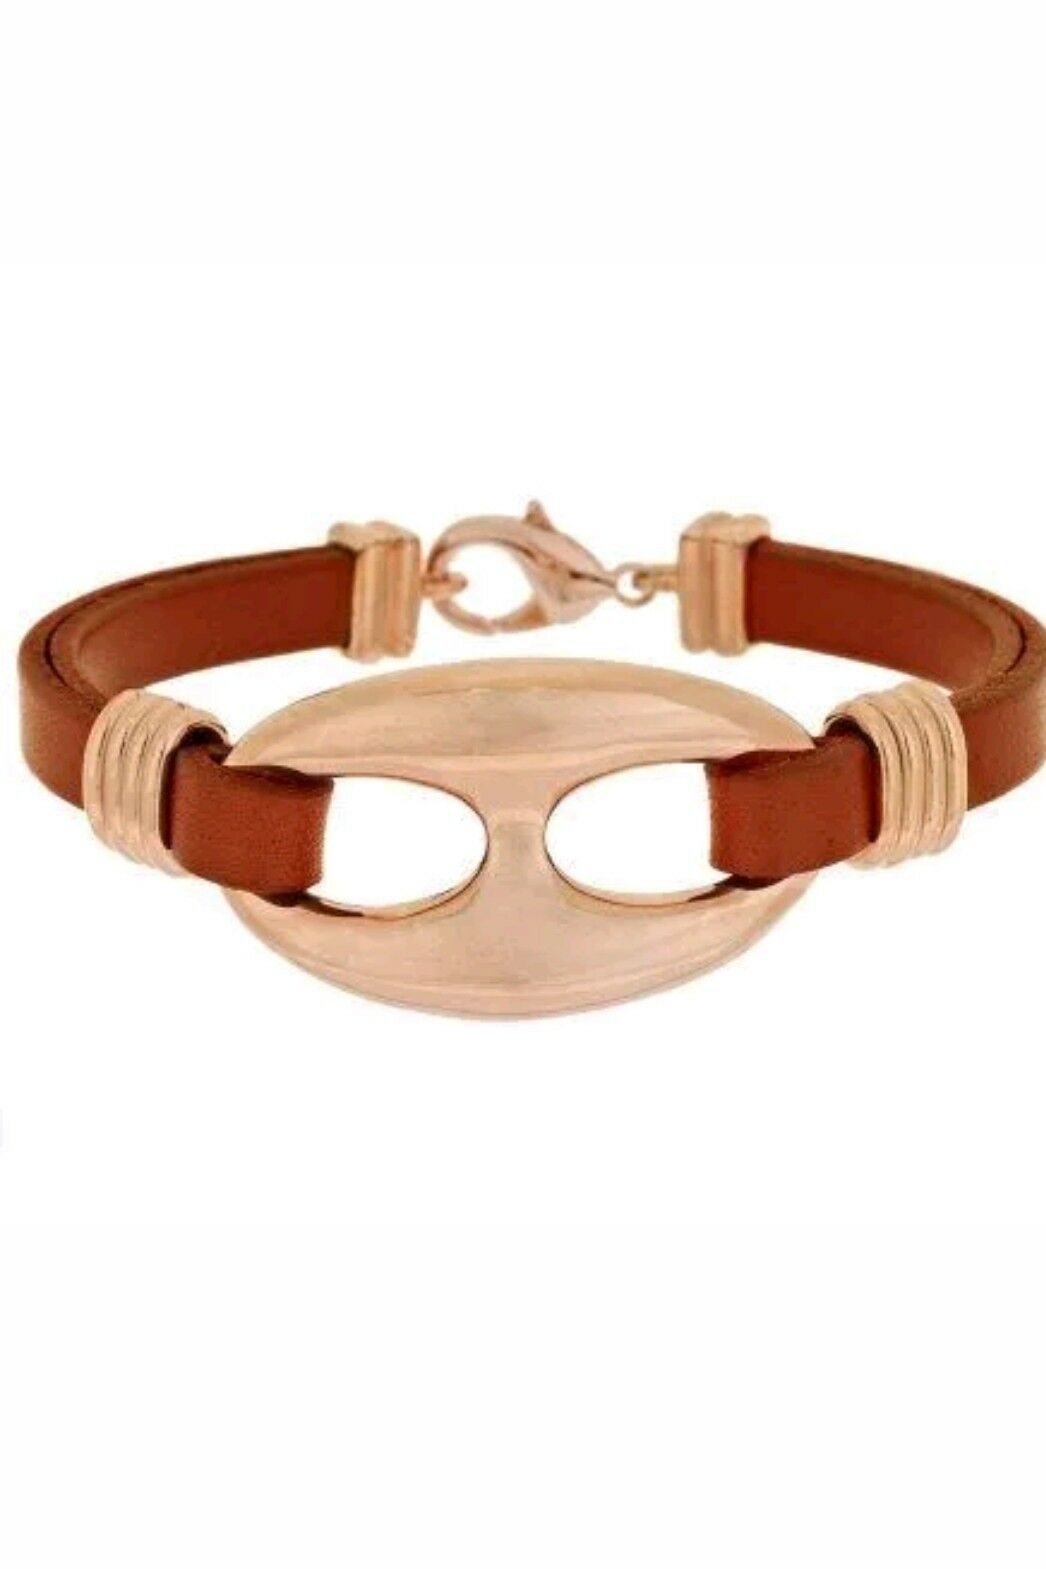 QVC Bronzo Italia Leather Link   Bracelet  orig  78 BEAUTIFUL GIFT unisex GIFT